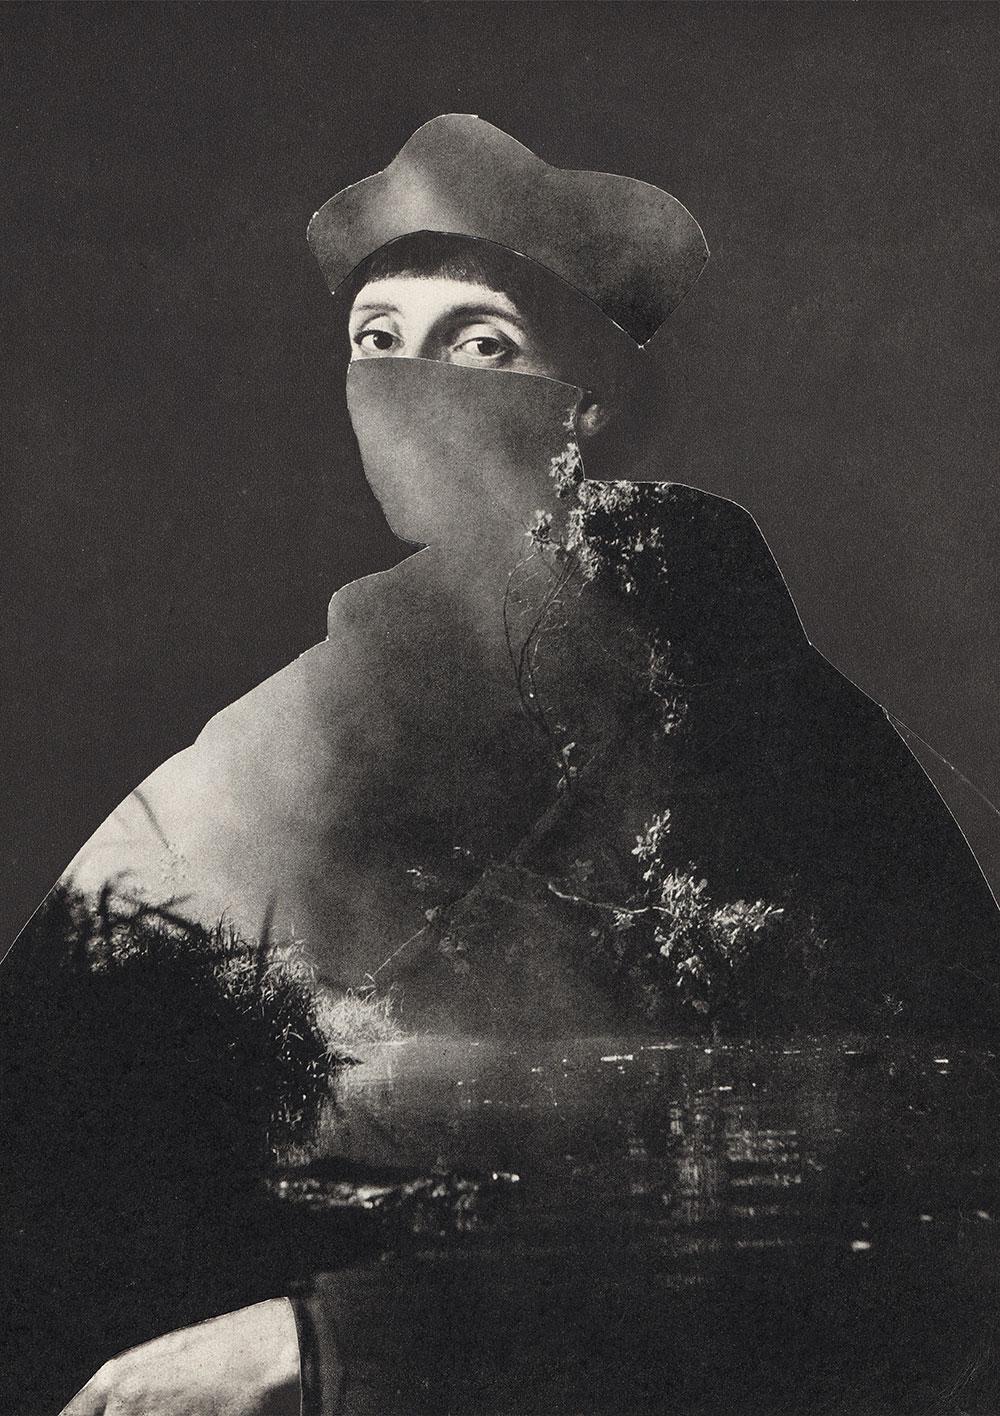 Silent-Figure-With-Landscape.jpg